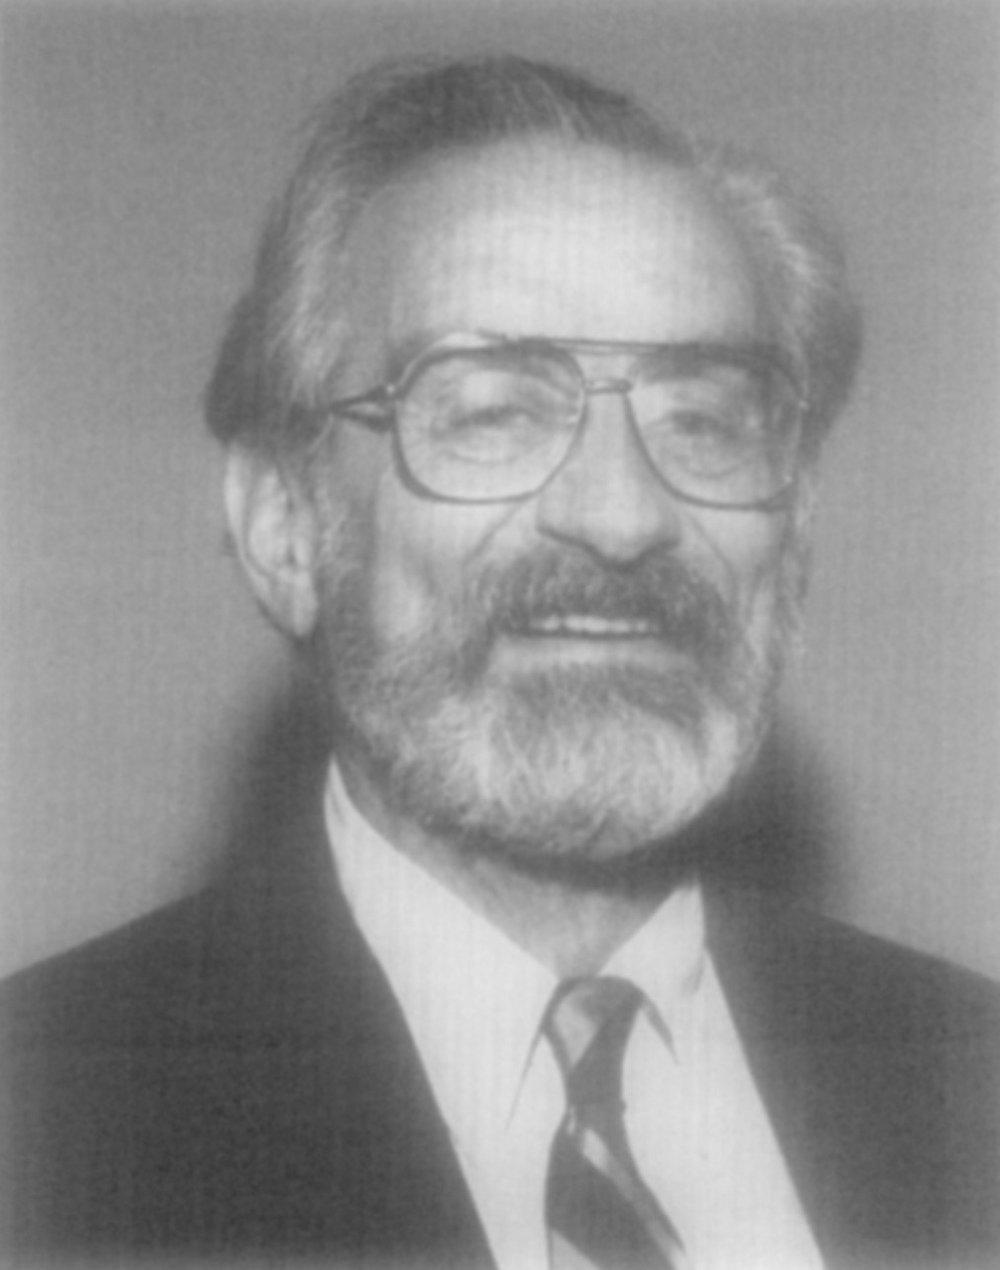 Dr. Edward H. Kass